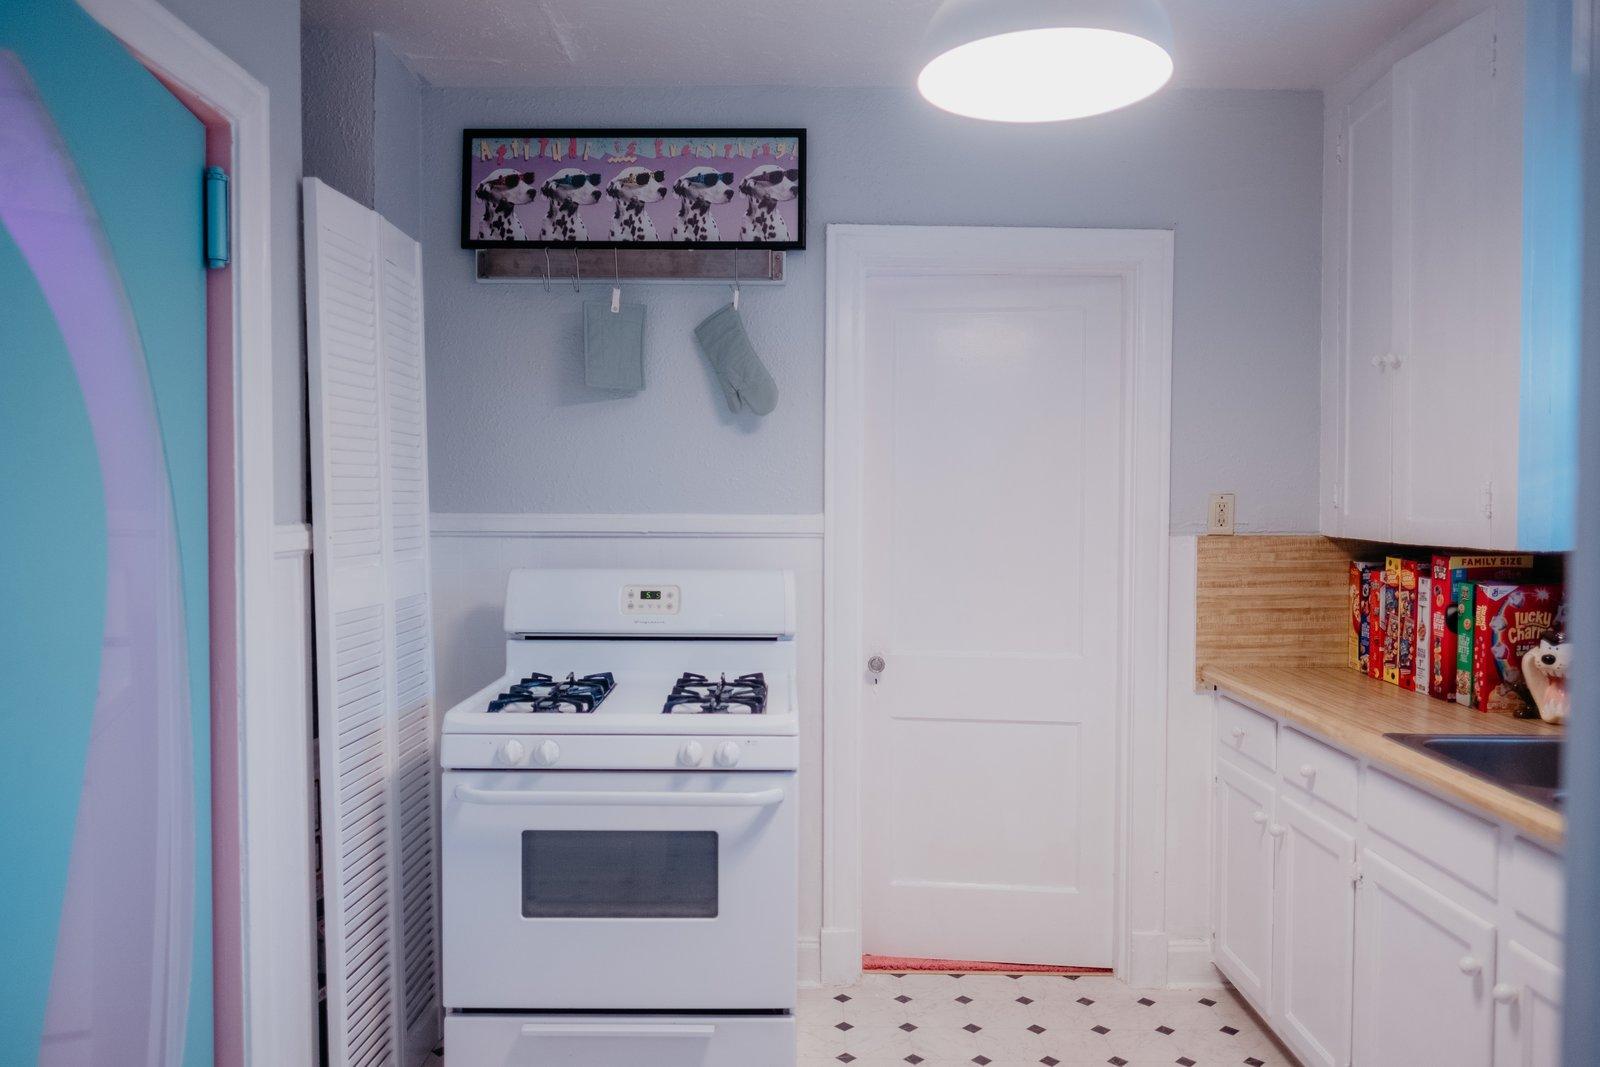 The Slater Airbnb Jeremy Kelsey Turner kitchen